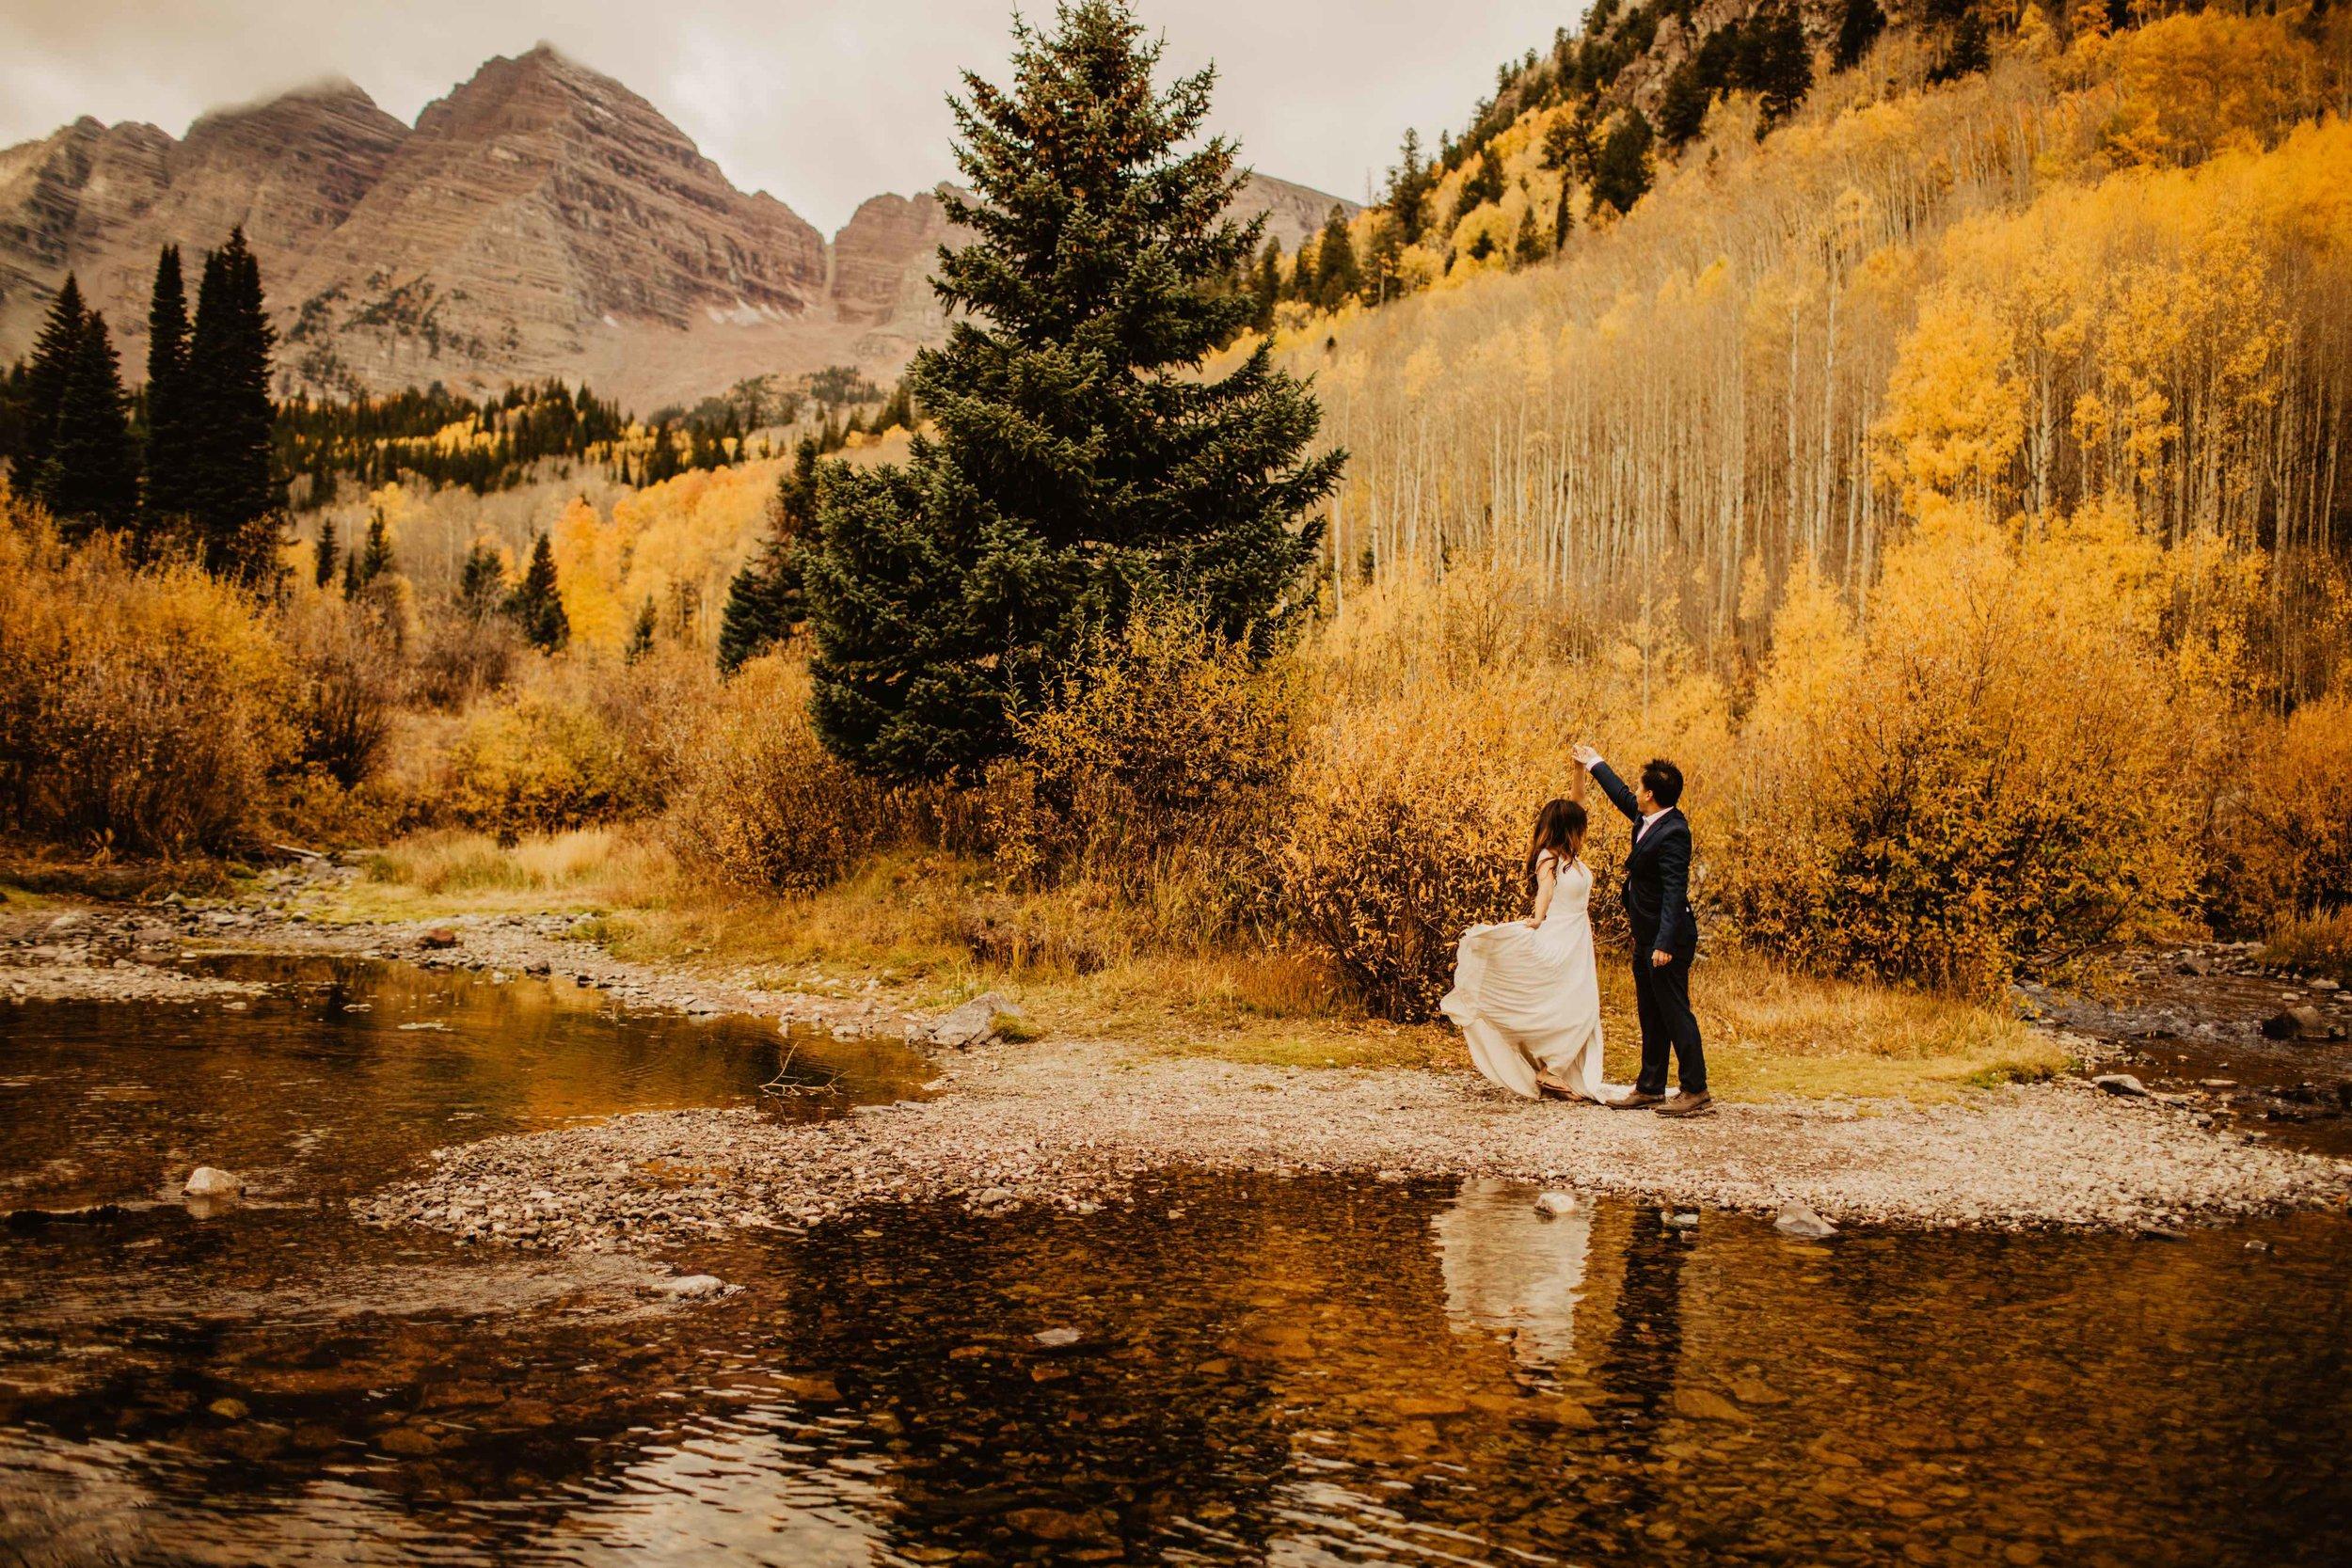 Kisa Conrad Favorites-0011-colorado-wedding-photographer-denver-springs-vail.jpeg